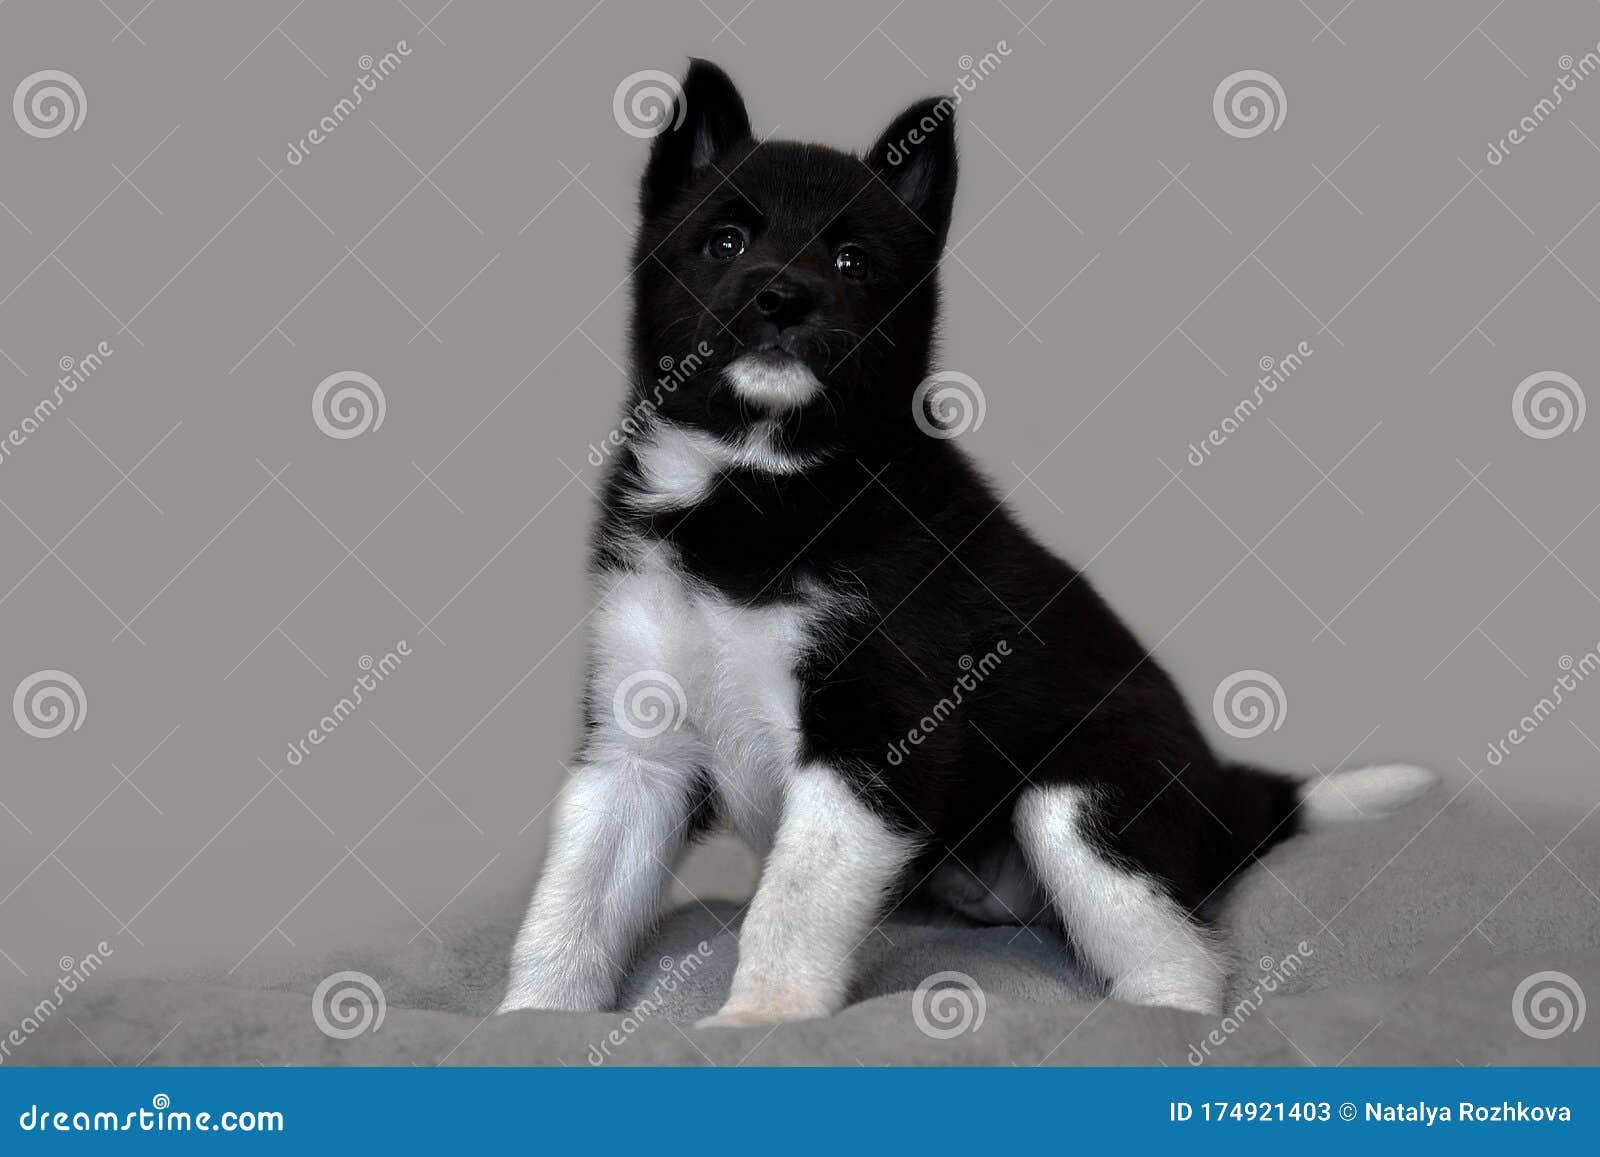 Cute Black Husky Puppy Stock Image Image Of Husky Baby 174921403